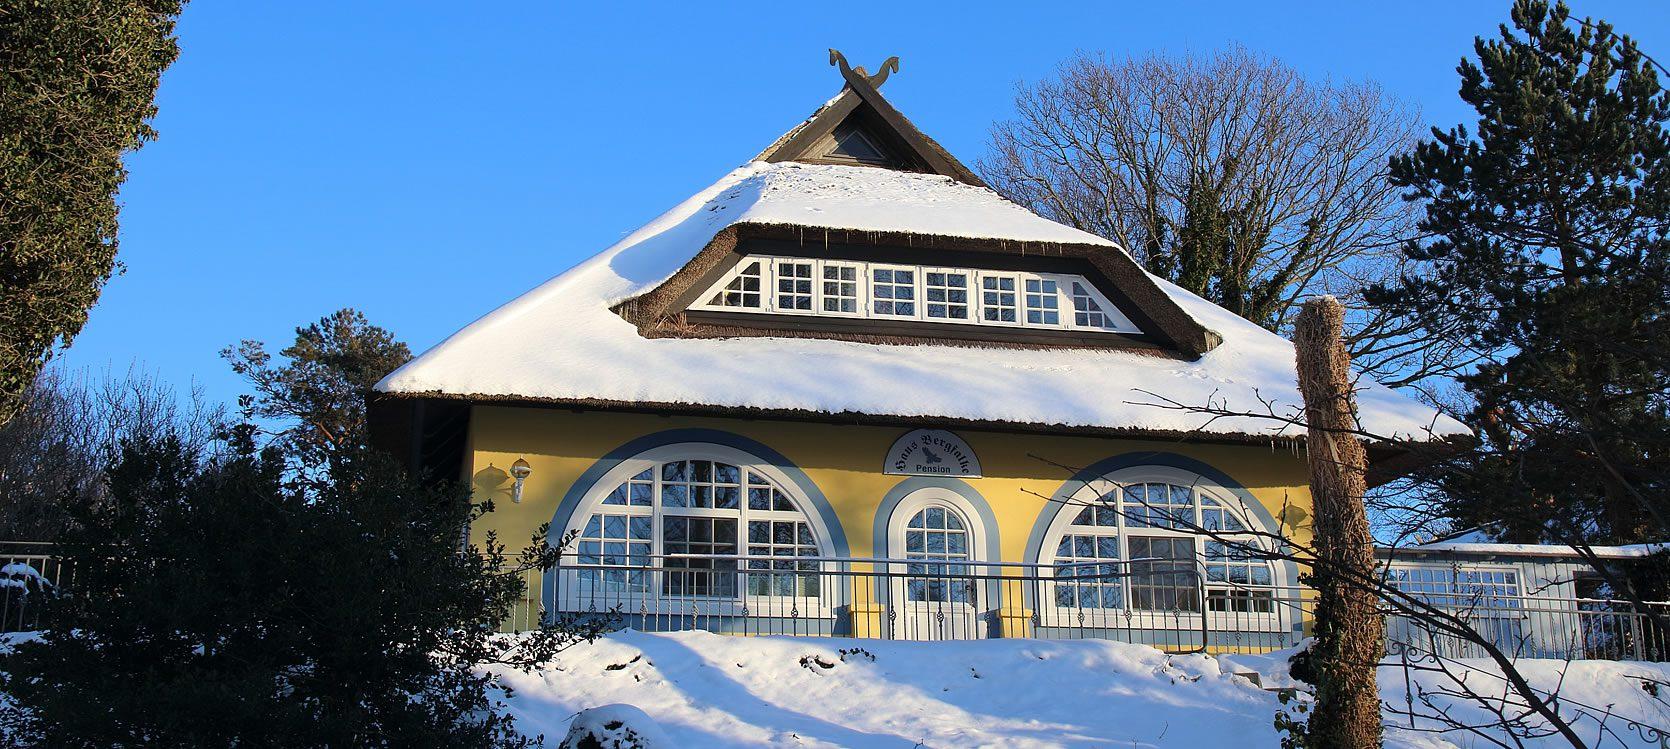 Gästehaus Bergfalke, Winter 2918